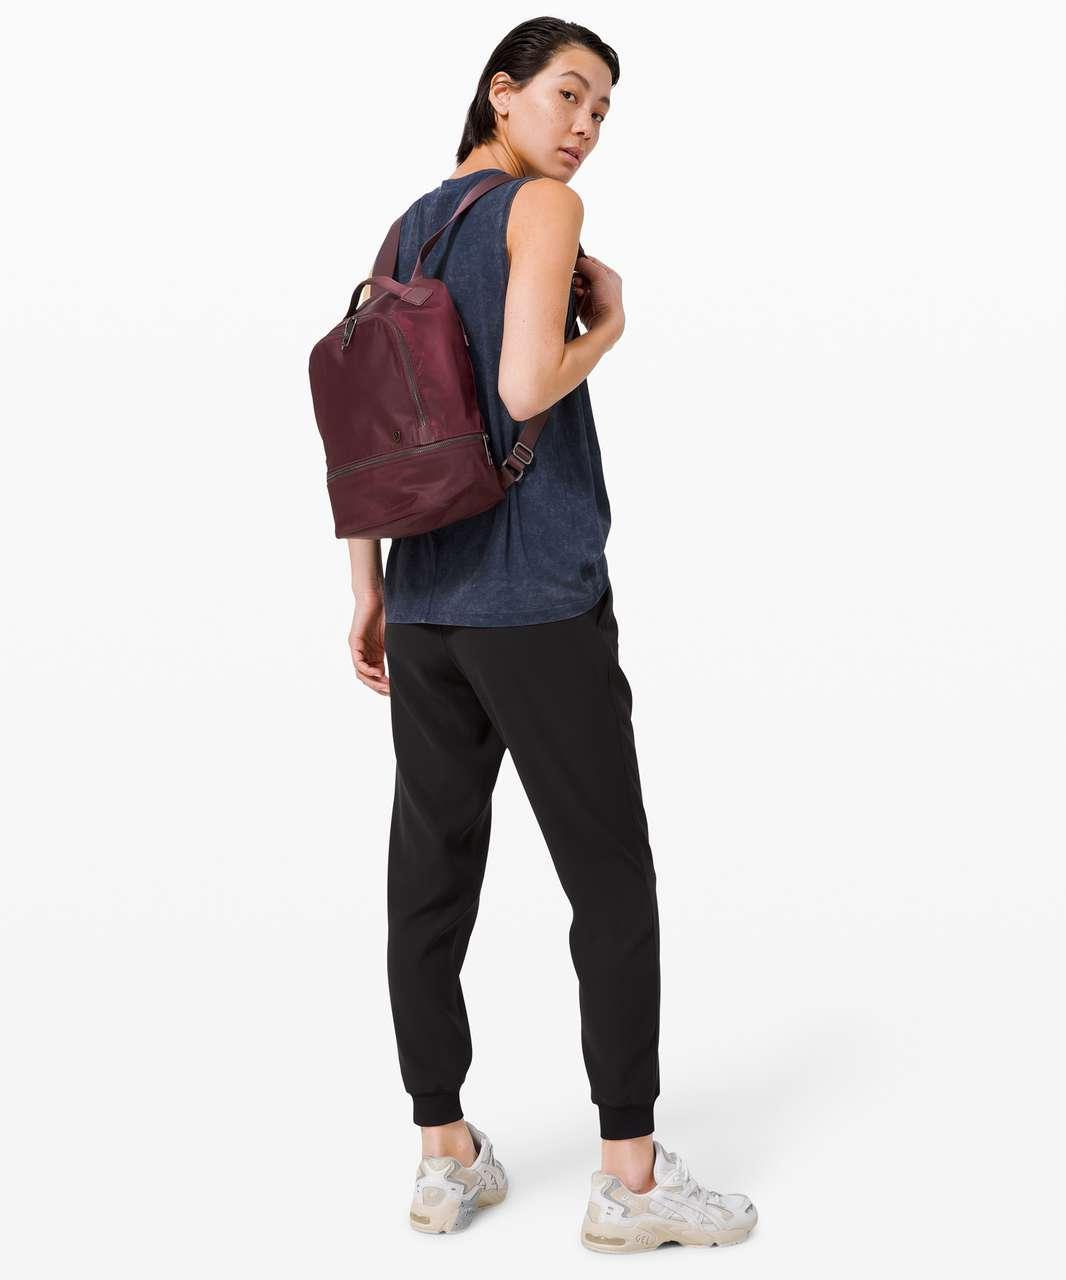 Lululemon City Adventurer Backpack Mini *10L - Cassis